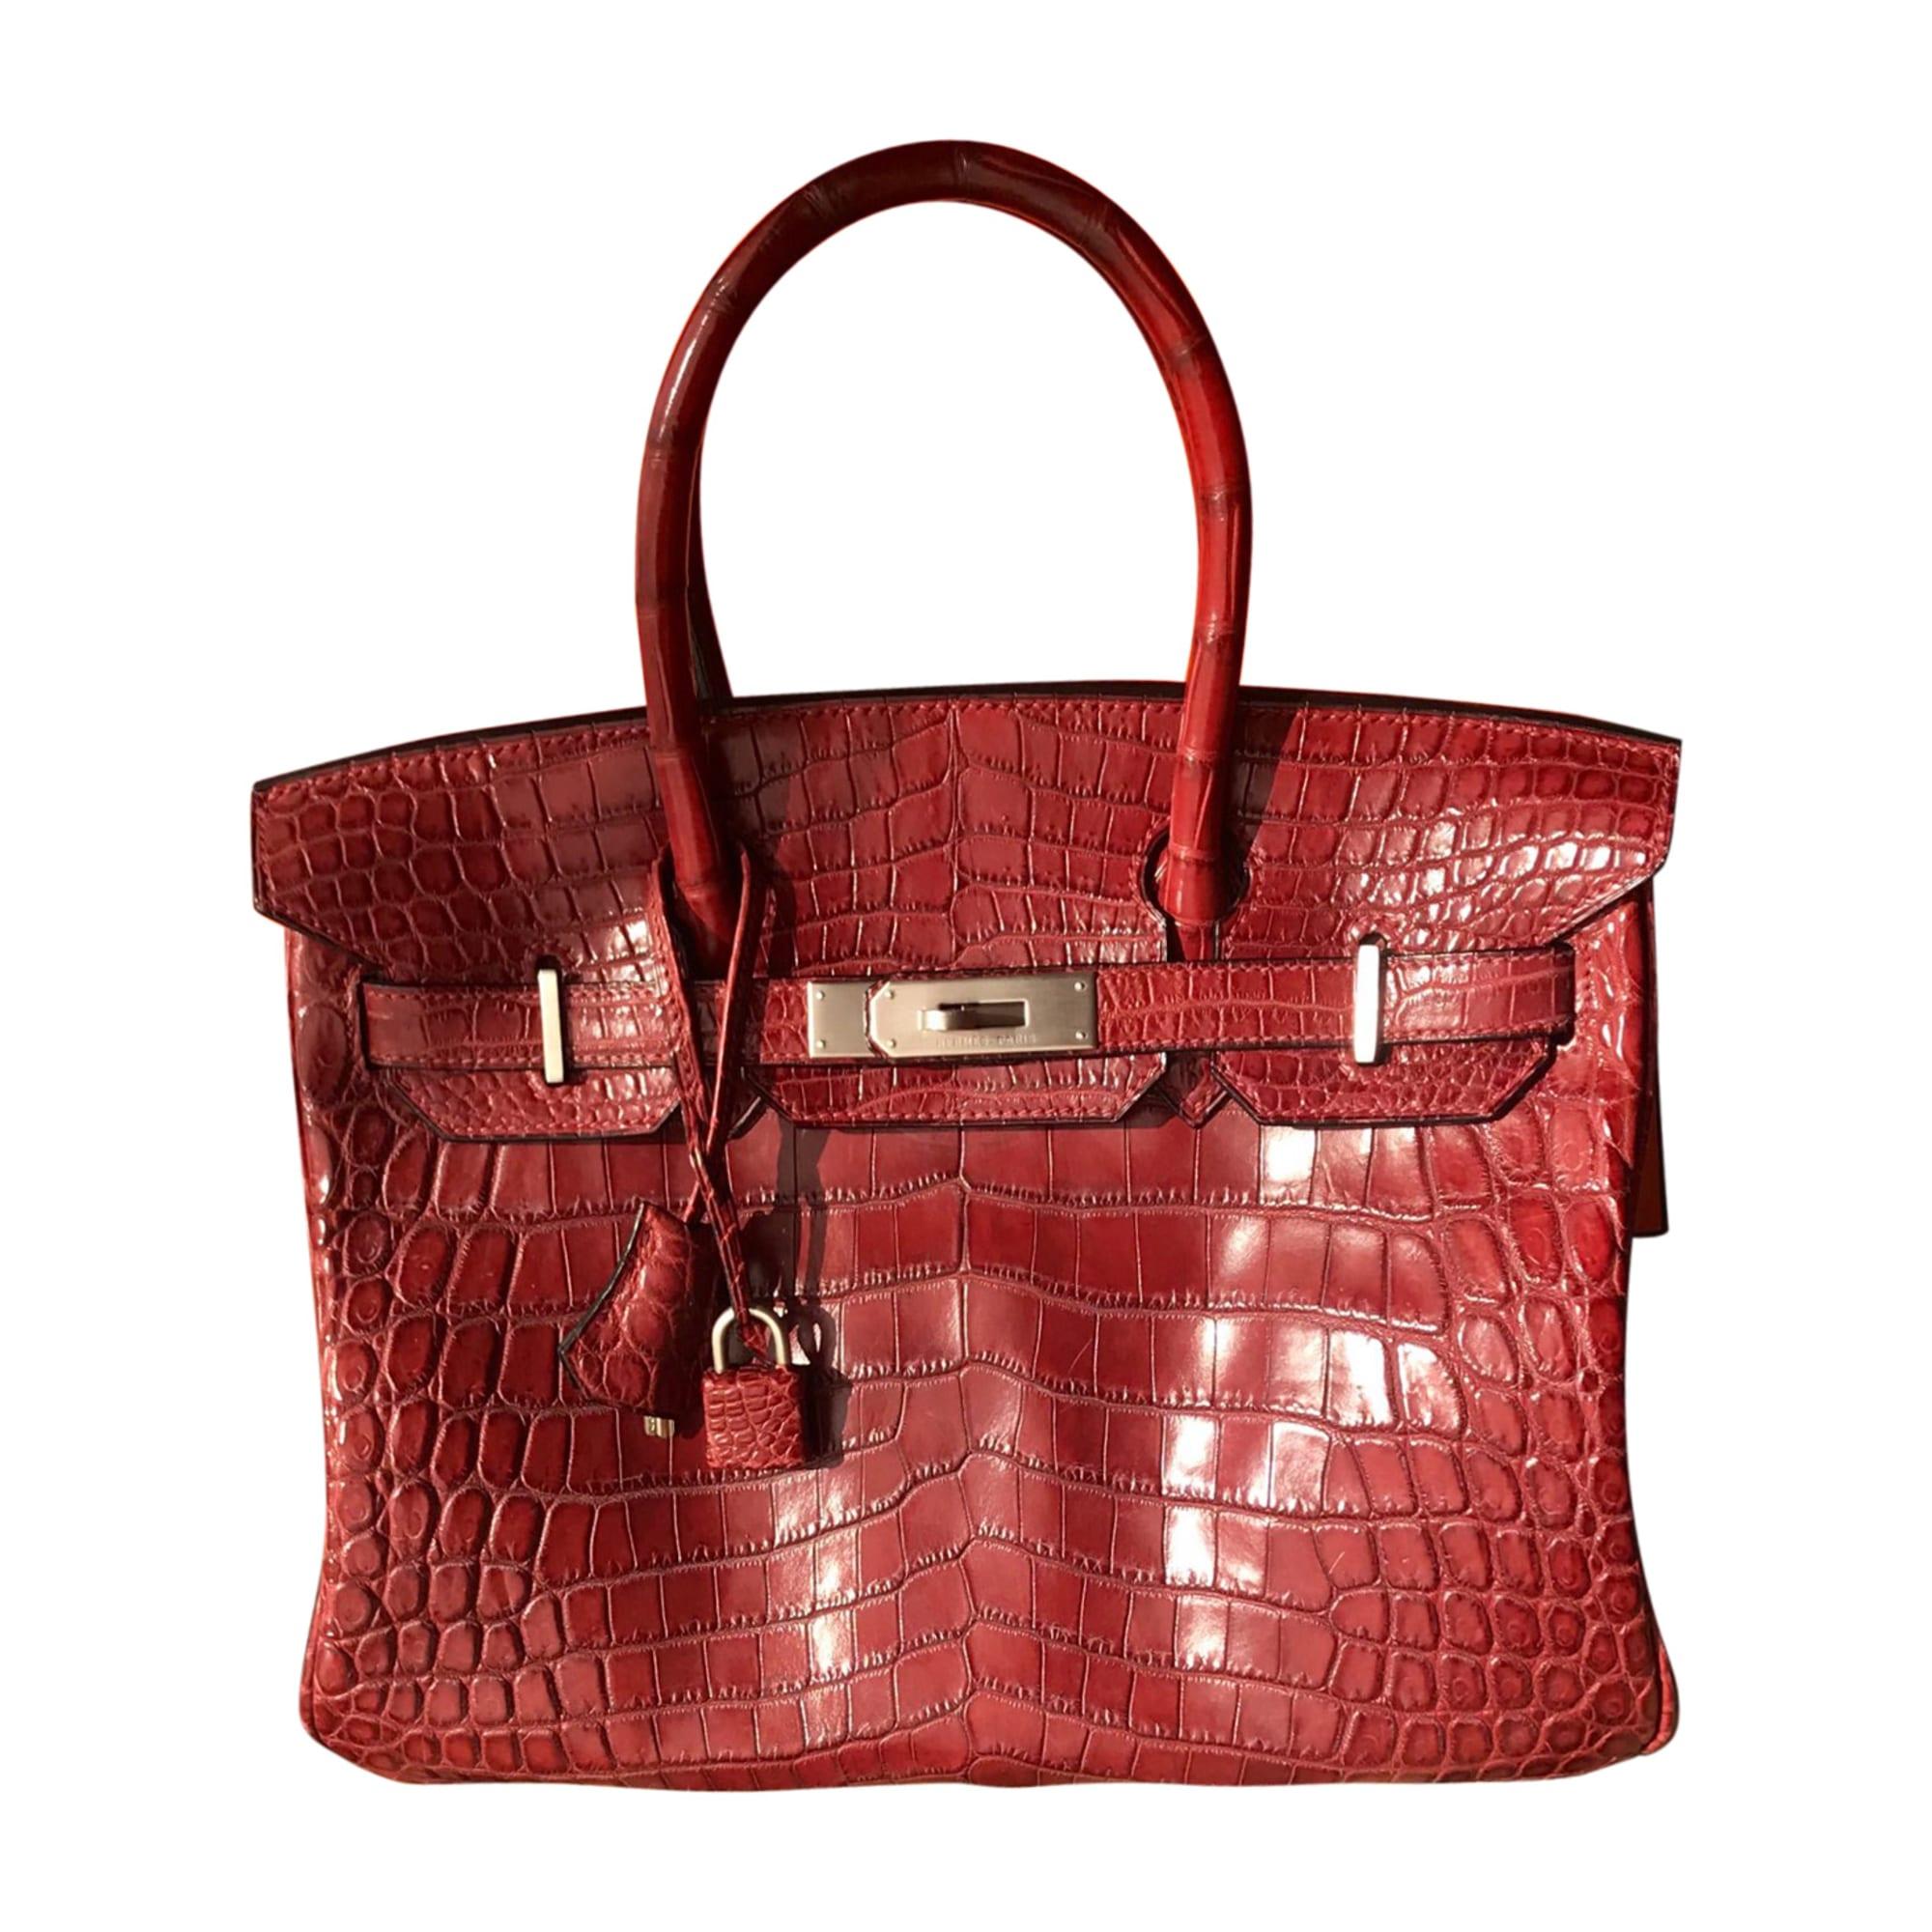 Lederhandtasche HERMÈS Birkin Rot, bordeauxrot